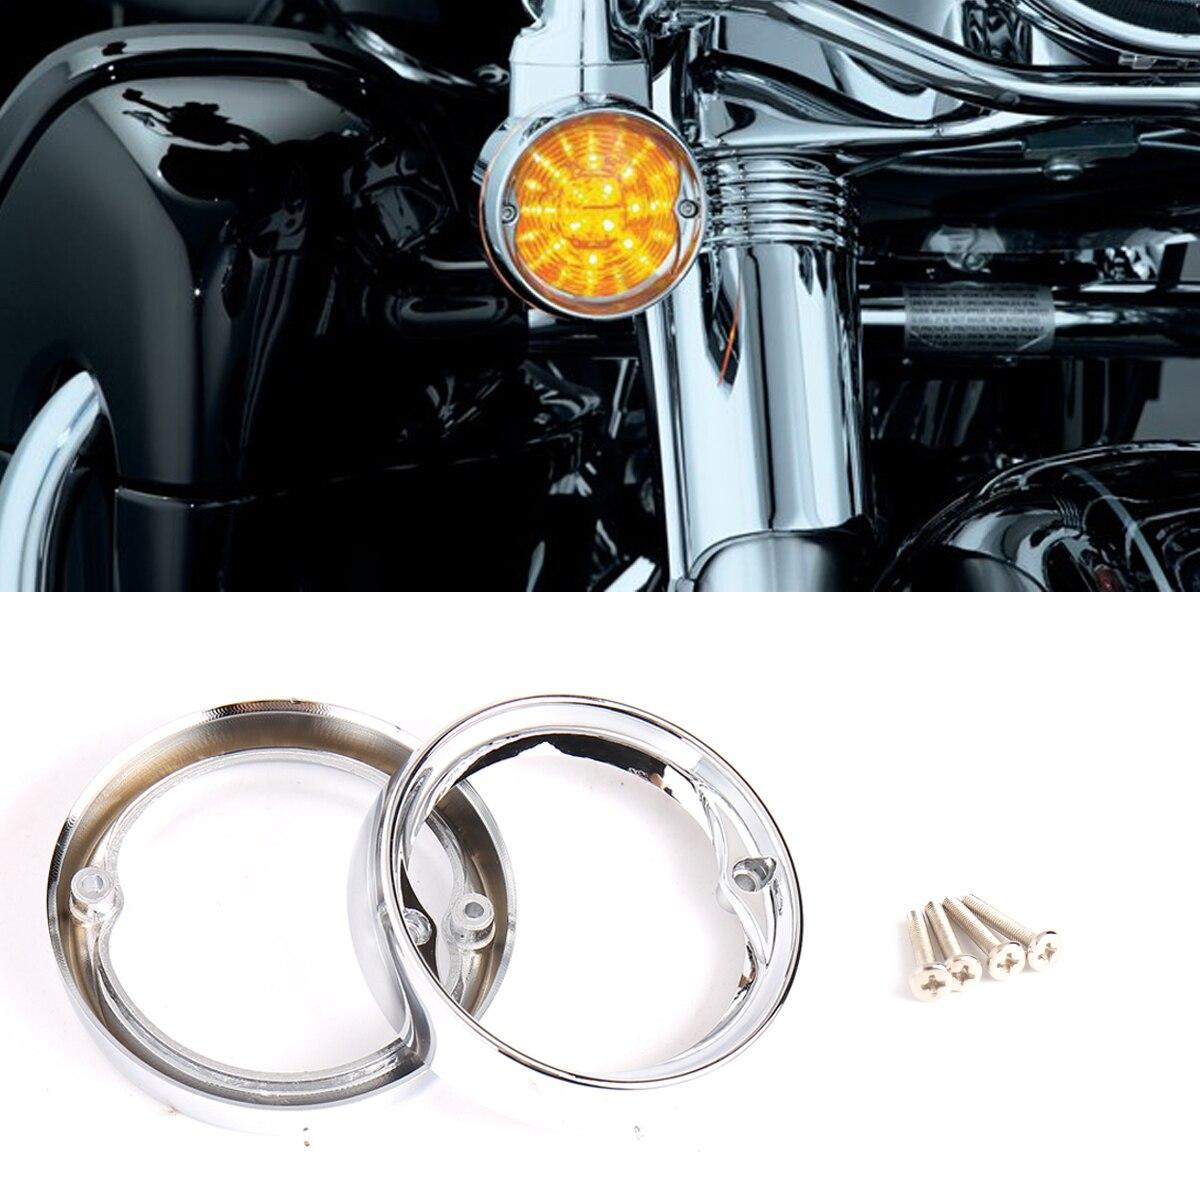 Chrome Deep Dish Flat Turn Signal Light Trim Ring Bezels For Harley Touring Street Glide FLH/T FLHX|chrome harley|harley chrome|harley trim - title=